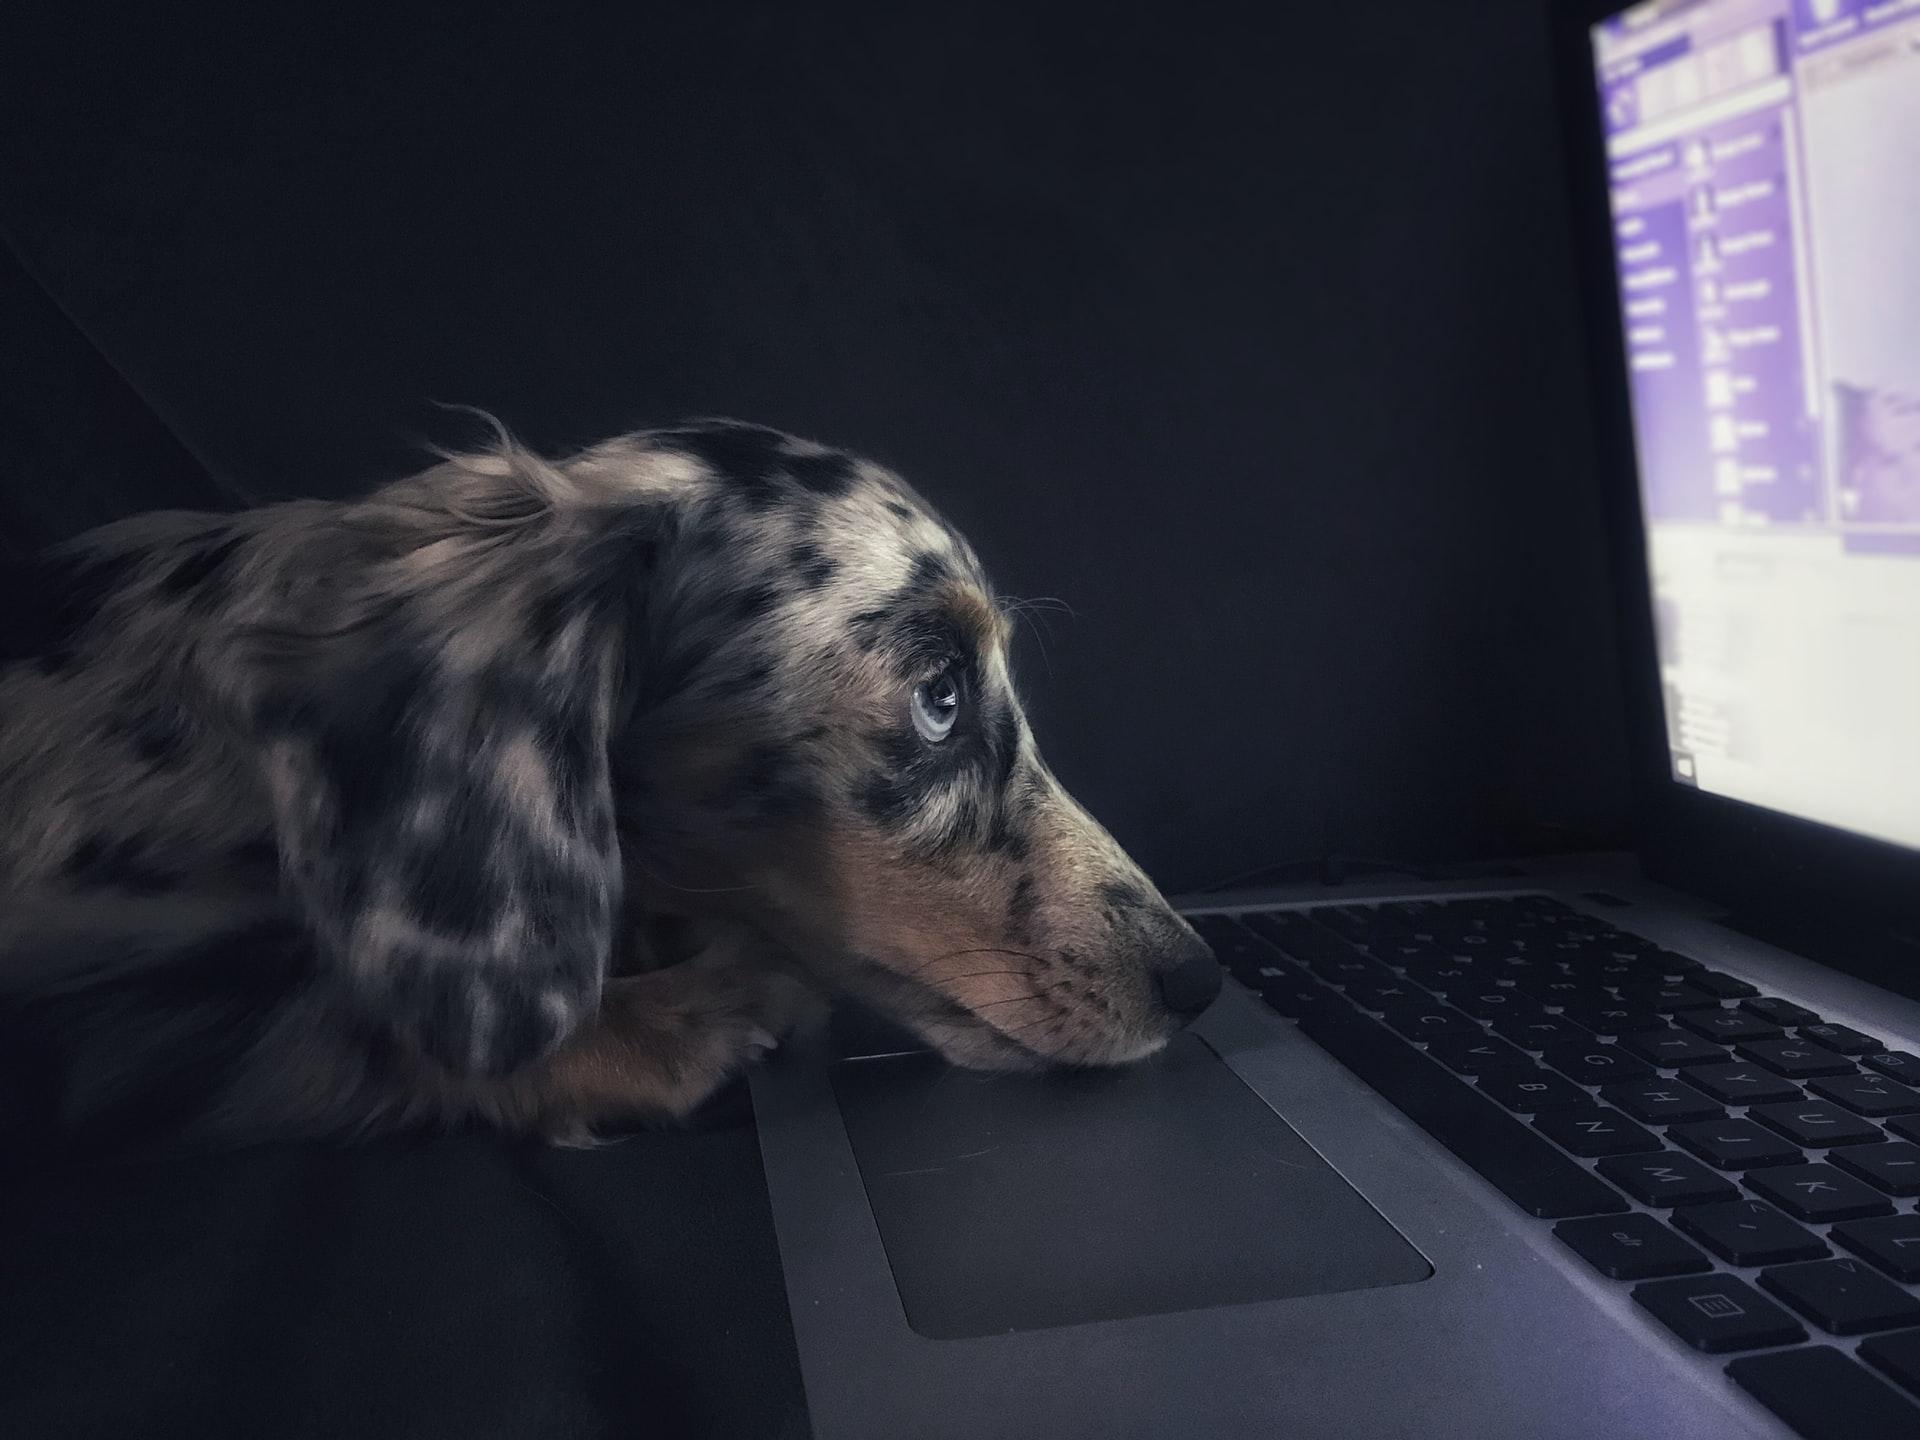 Online puppy preschool